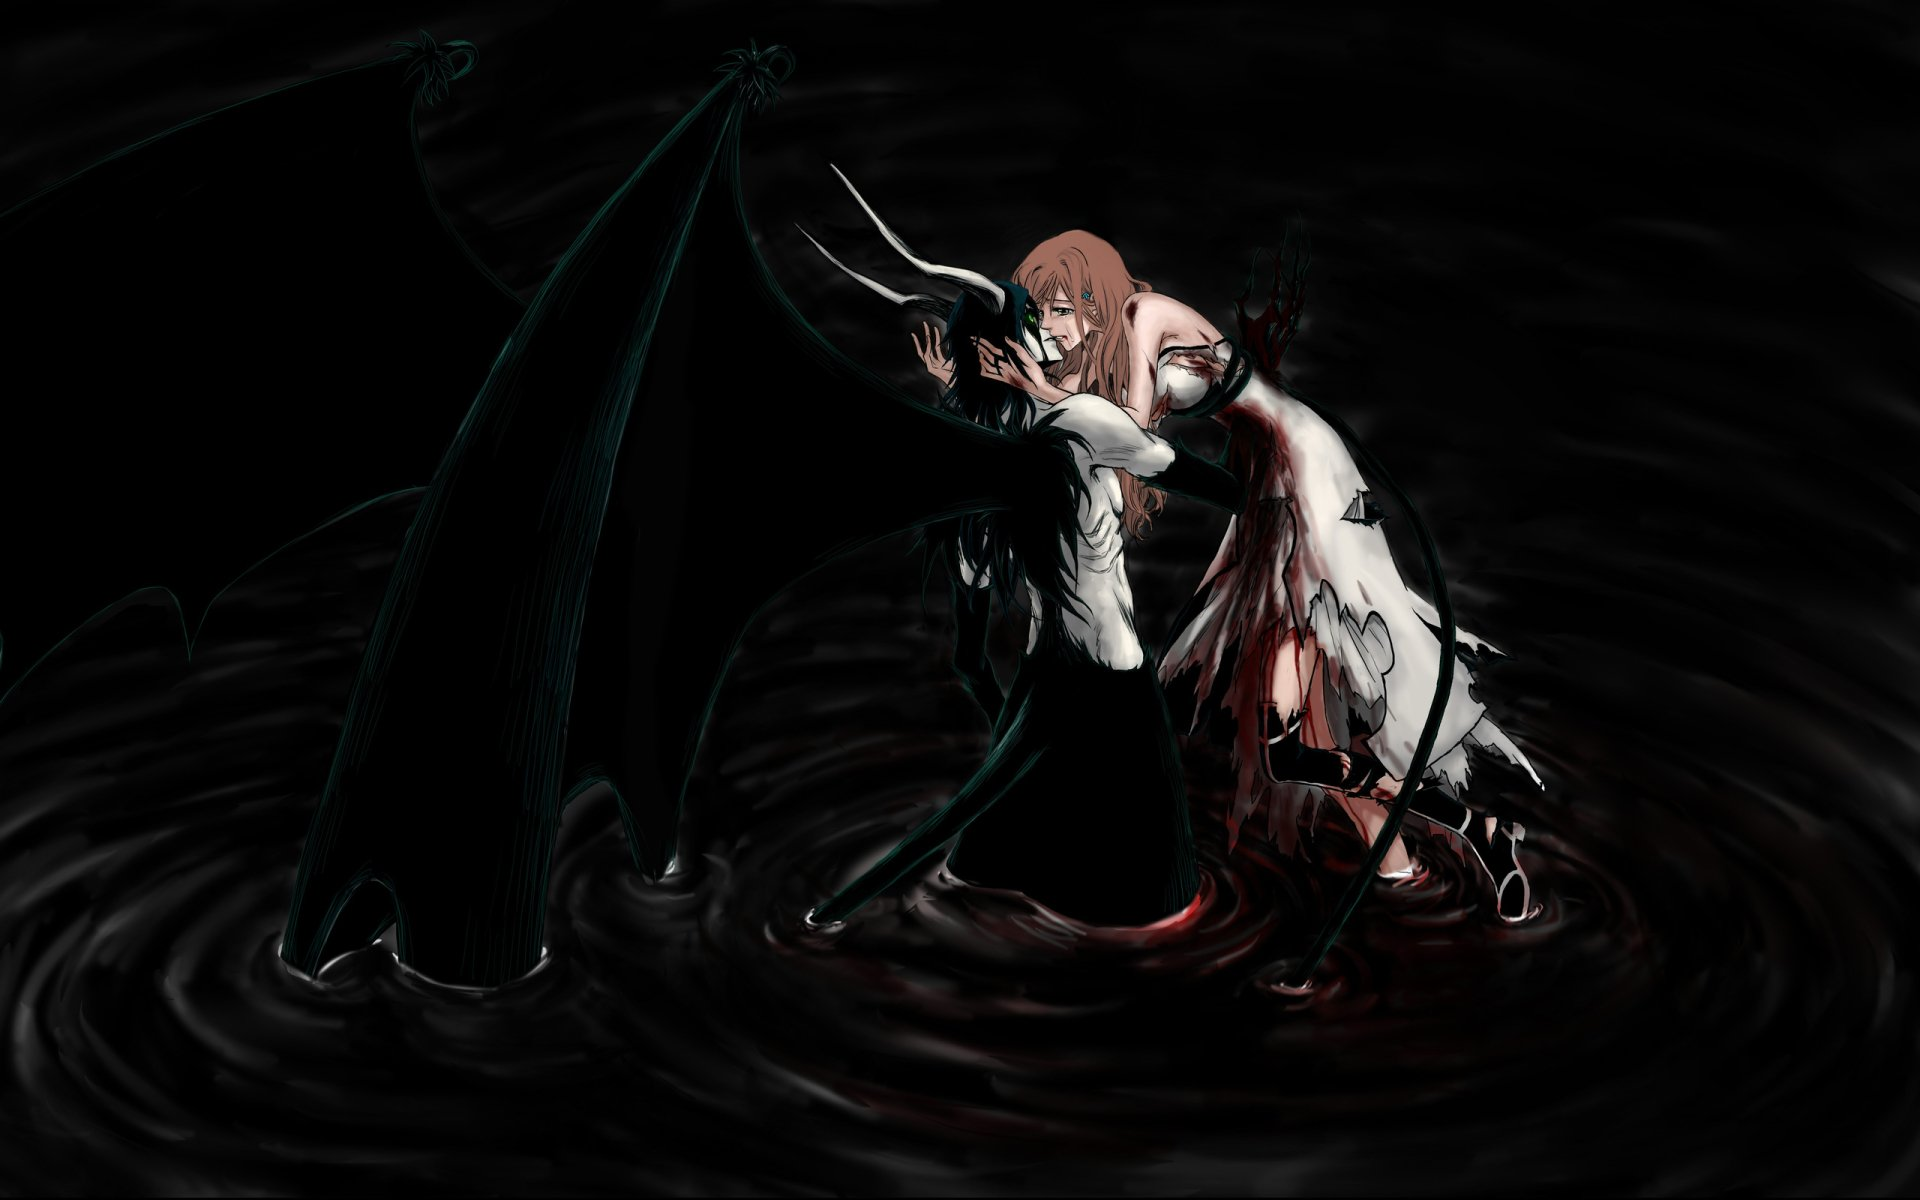 Anime - Bleach  Orihime Inoue Ulquiorra Cifer Wallpaper